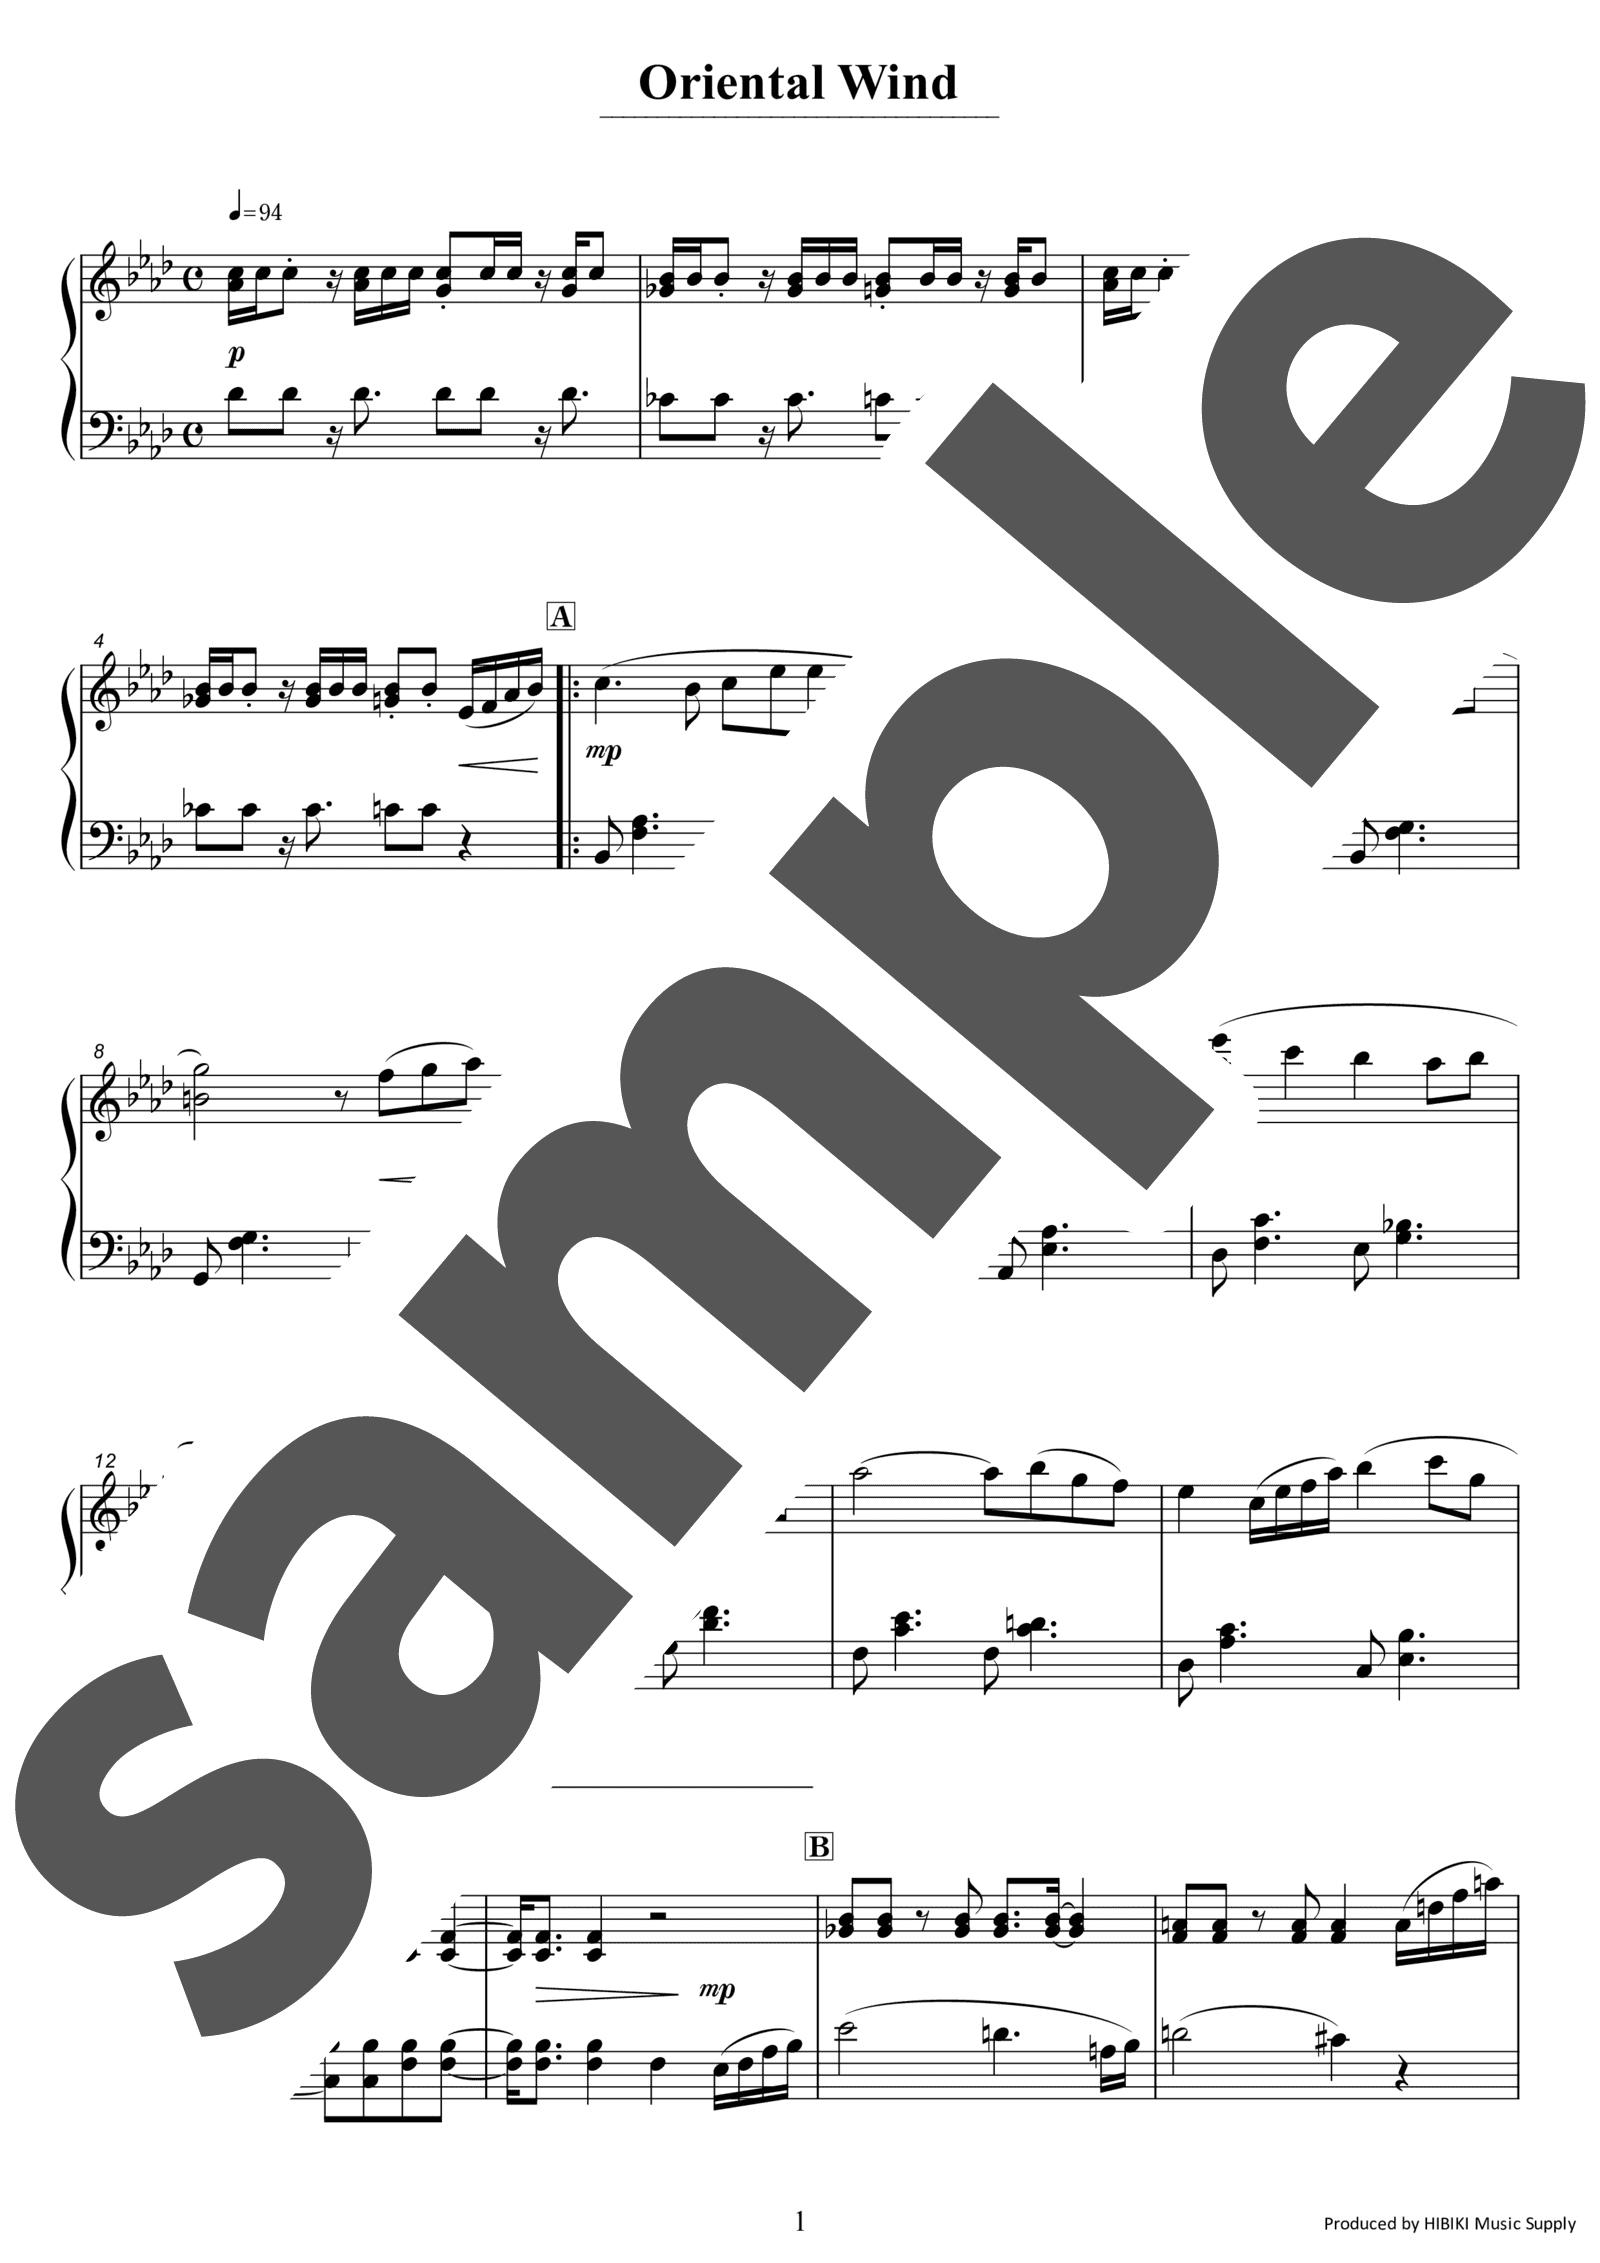 「Oriental Wind」のサンプル楽譜